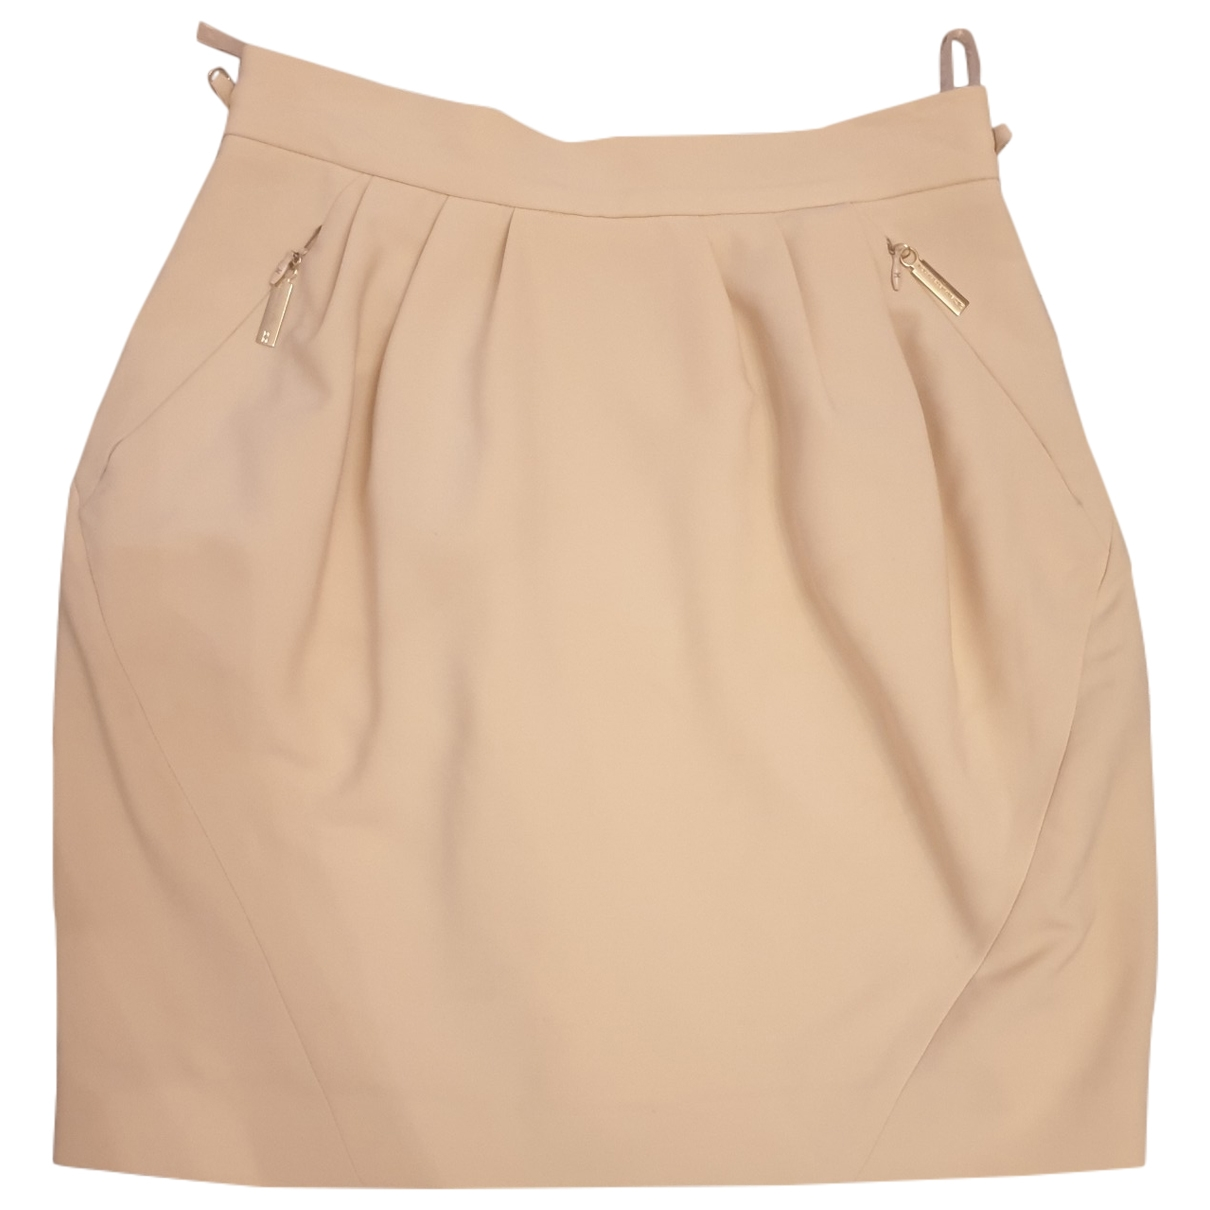 Elisabetta Franchi \N Beige skirt for Women 42 IT